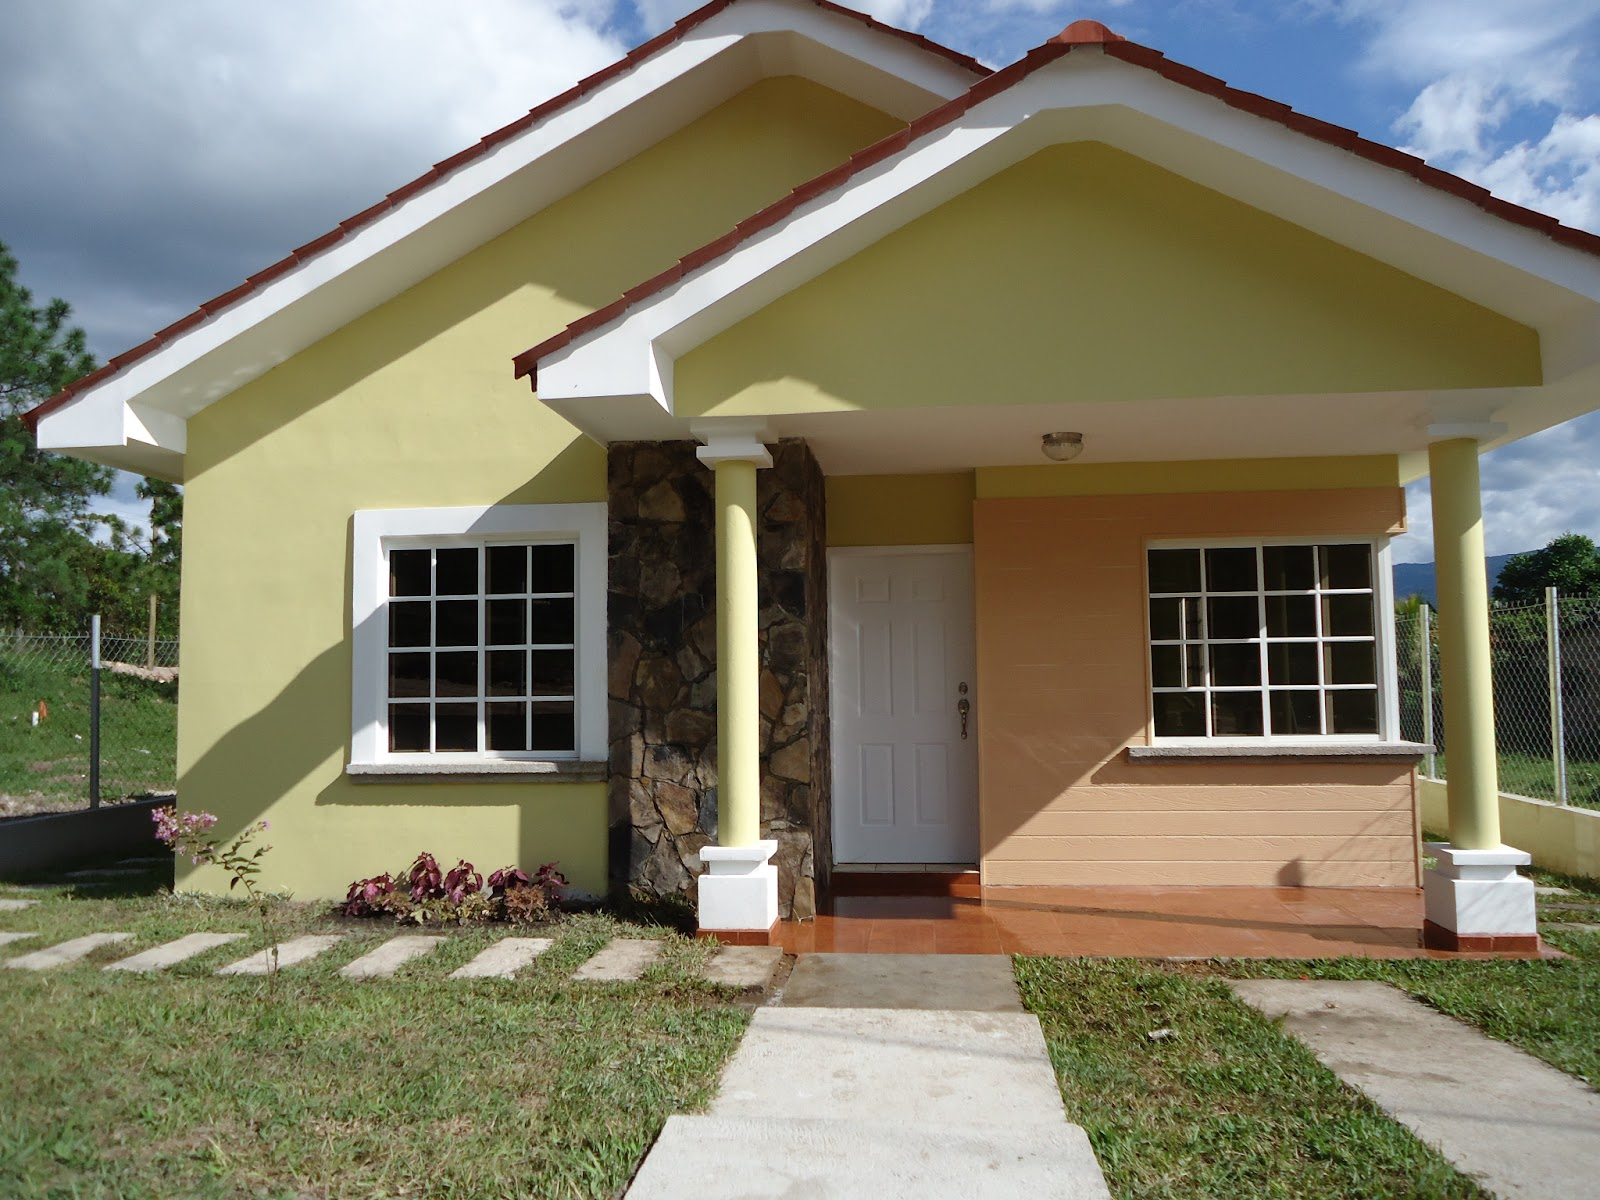 Casas de madera prefabricadas casas prefabricadas buenos aires - Casas prefabricadas buenos aires ...